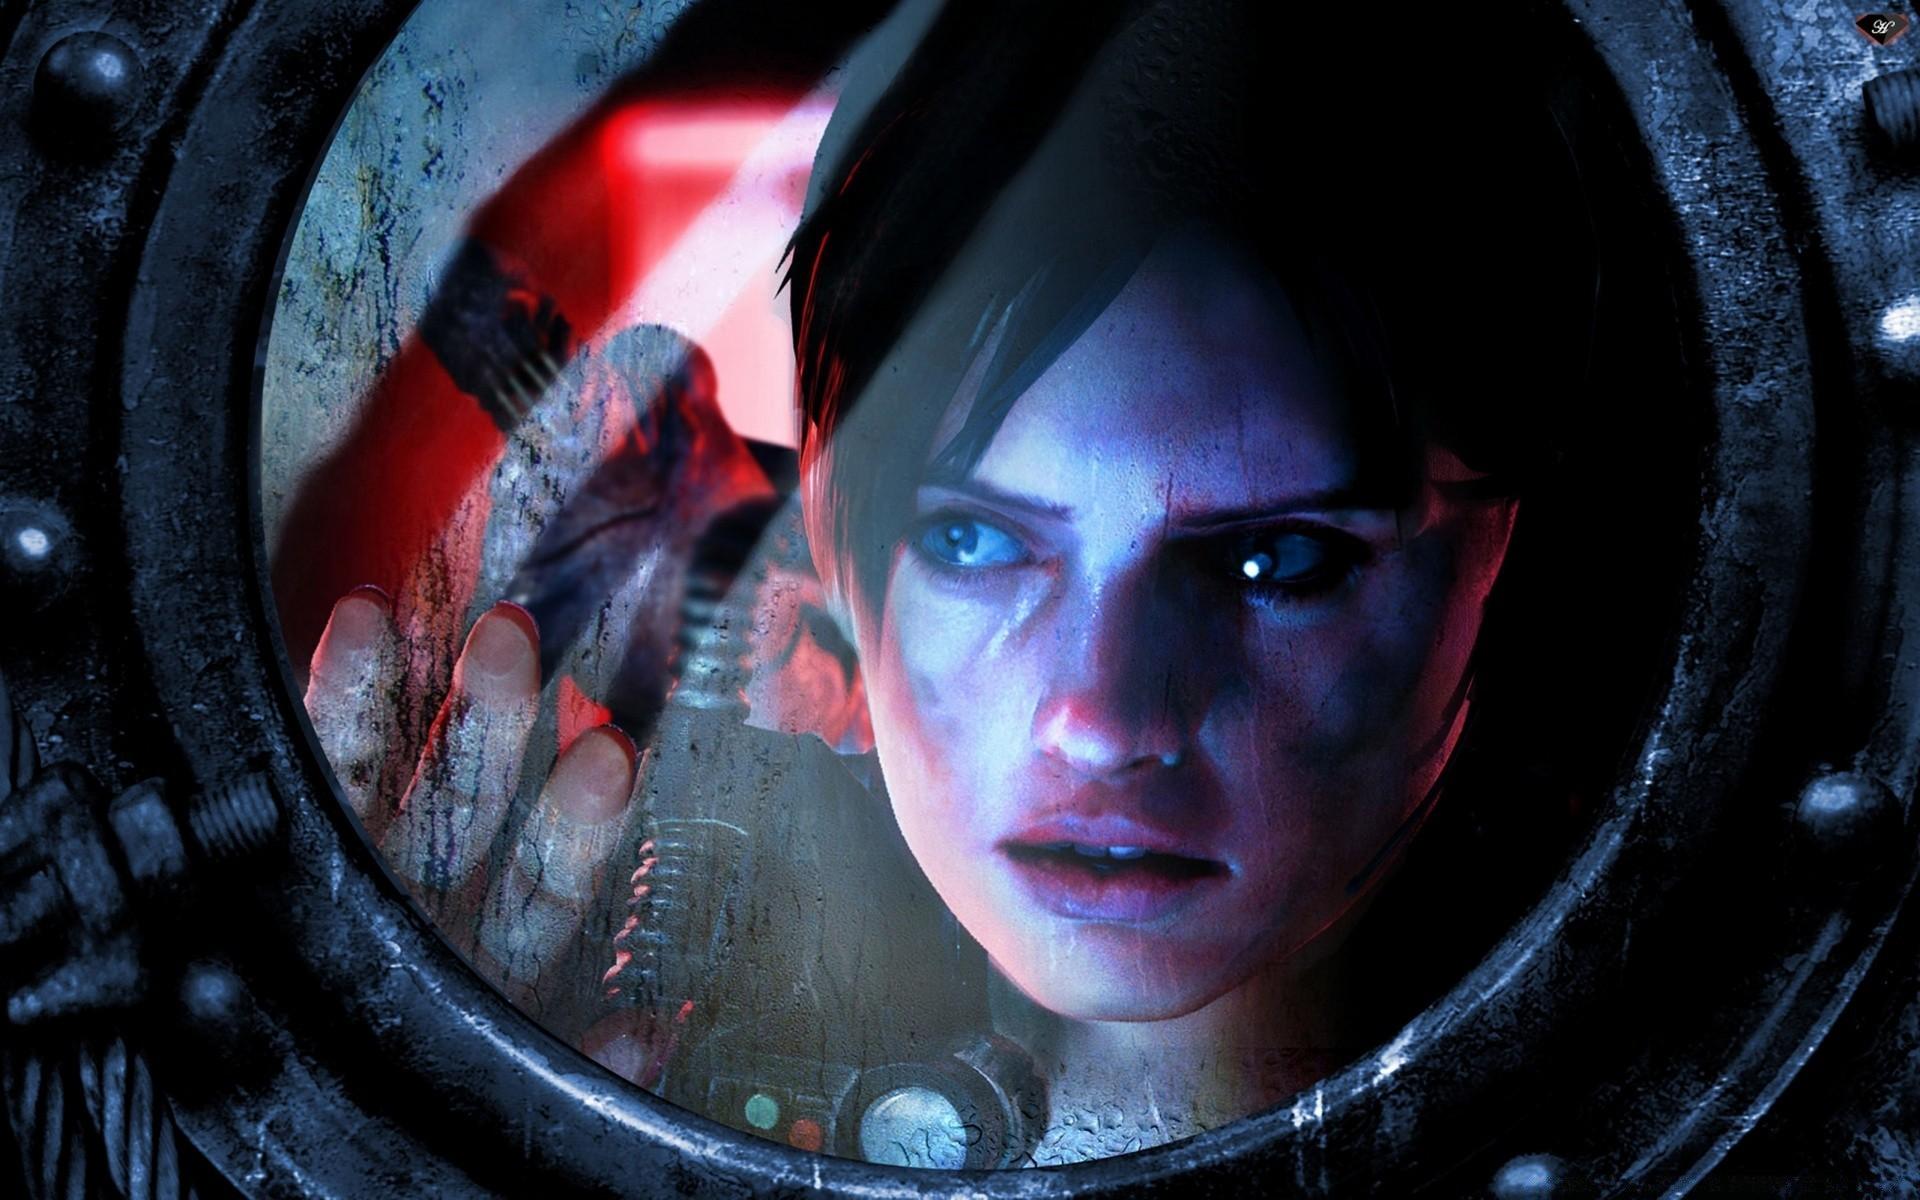 Resident Evil Revelations Jill Valentine Android Wallpapers